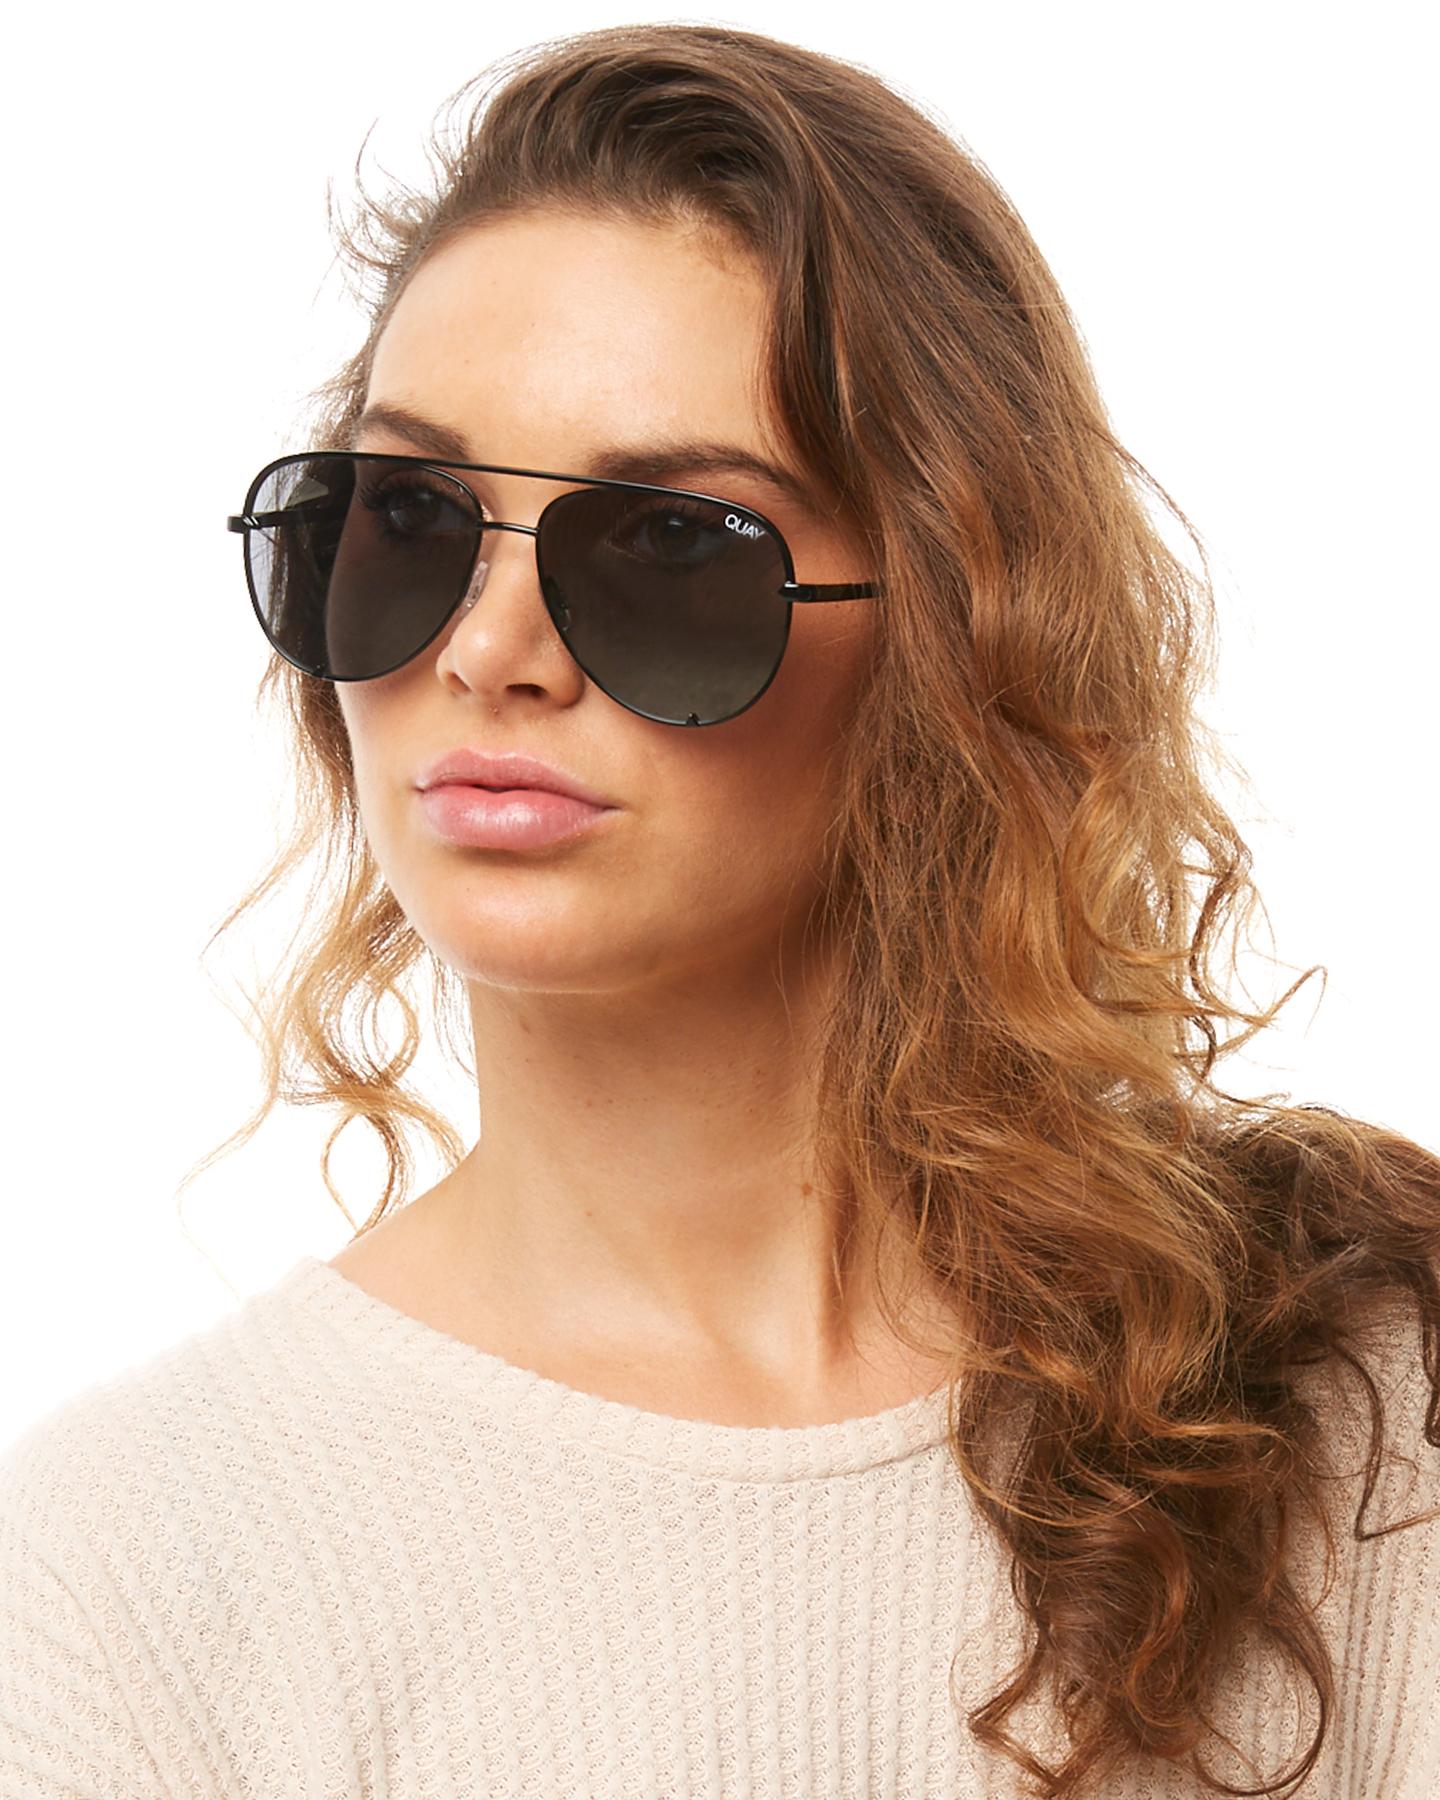 93d3534f354 New Quay Eyewear Women s High Key Mini Sunglasses Stainless Steel ...